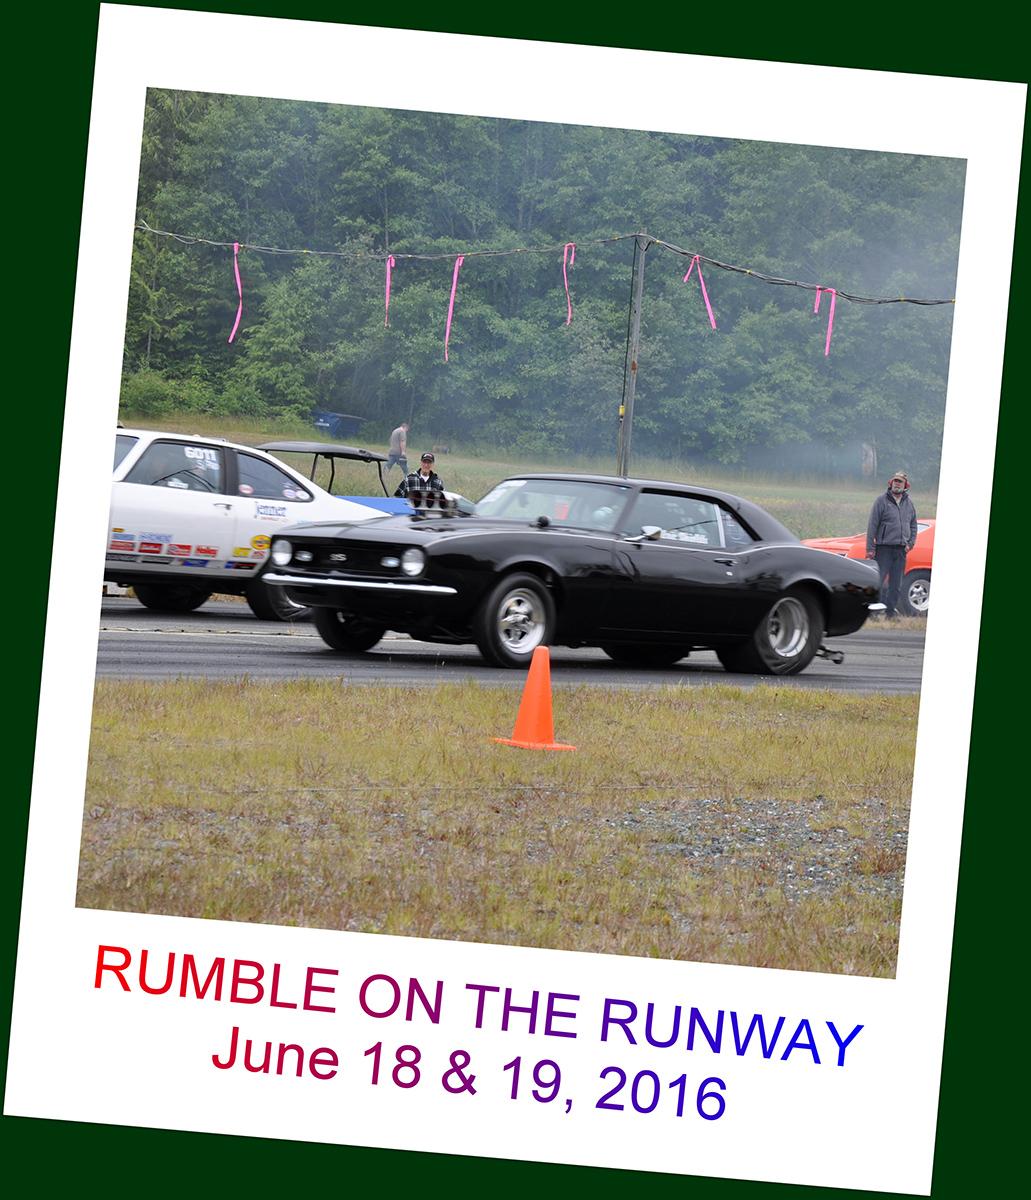 Rumble on the Runway June 18 & 19, 2016 949